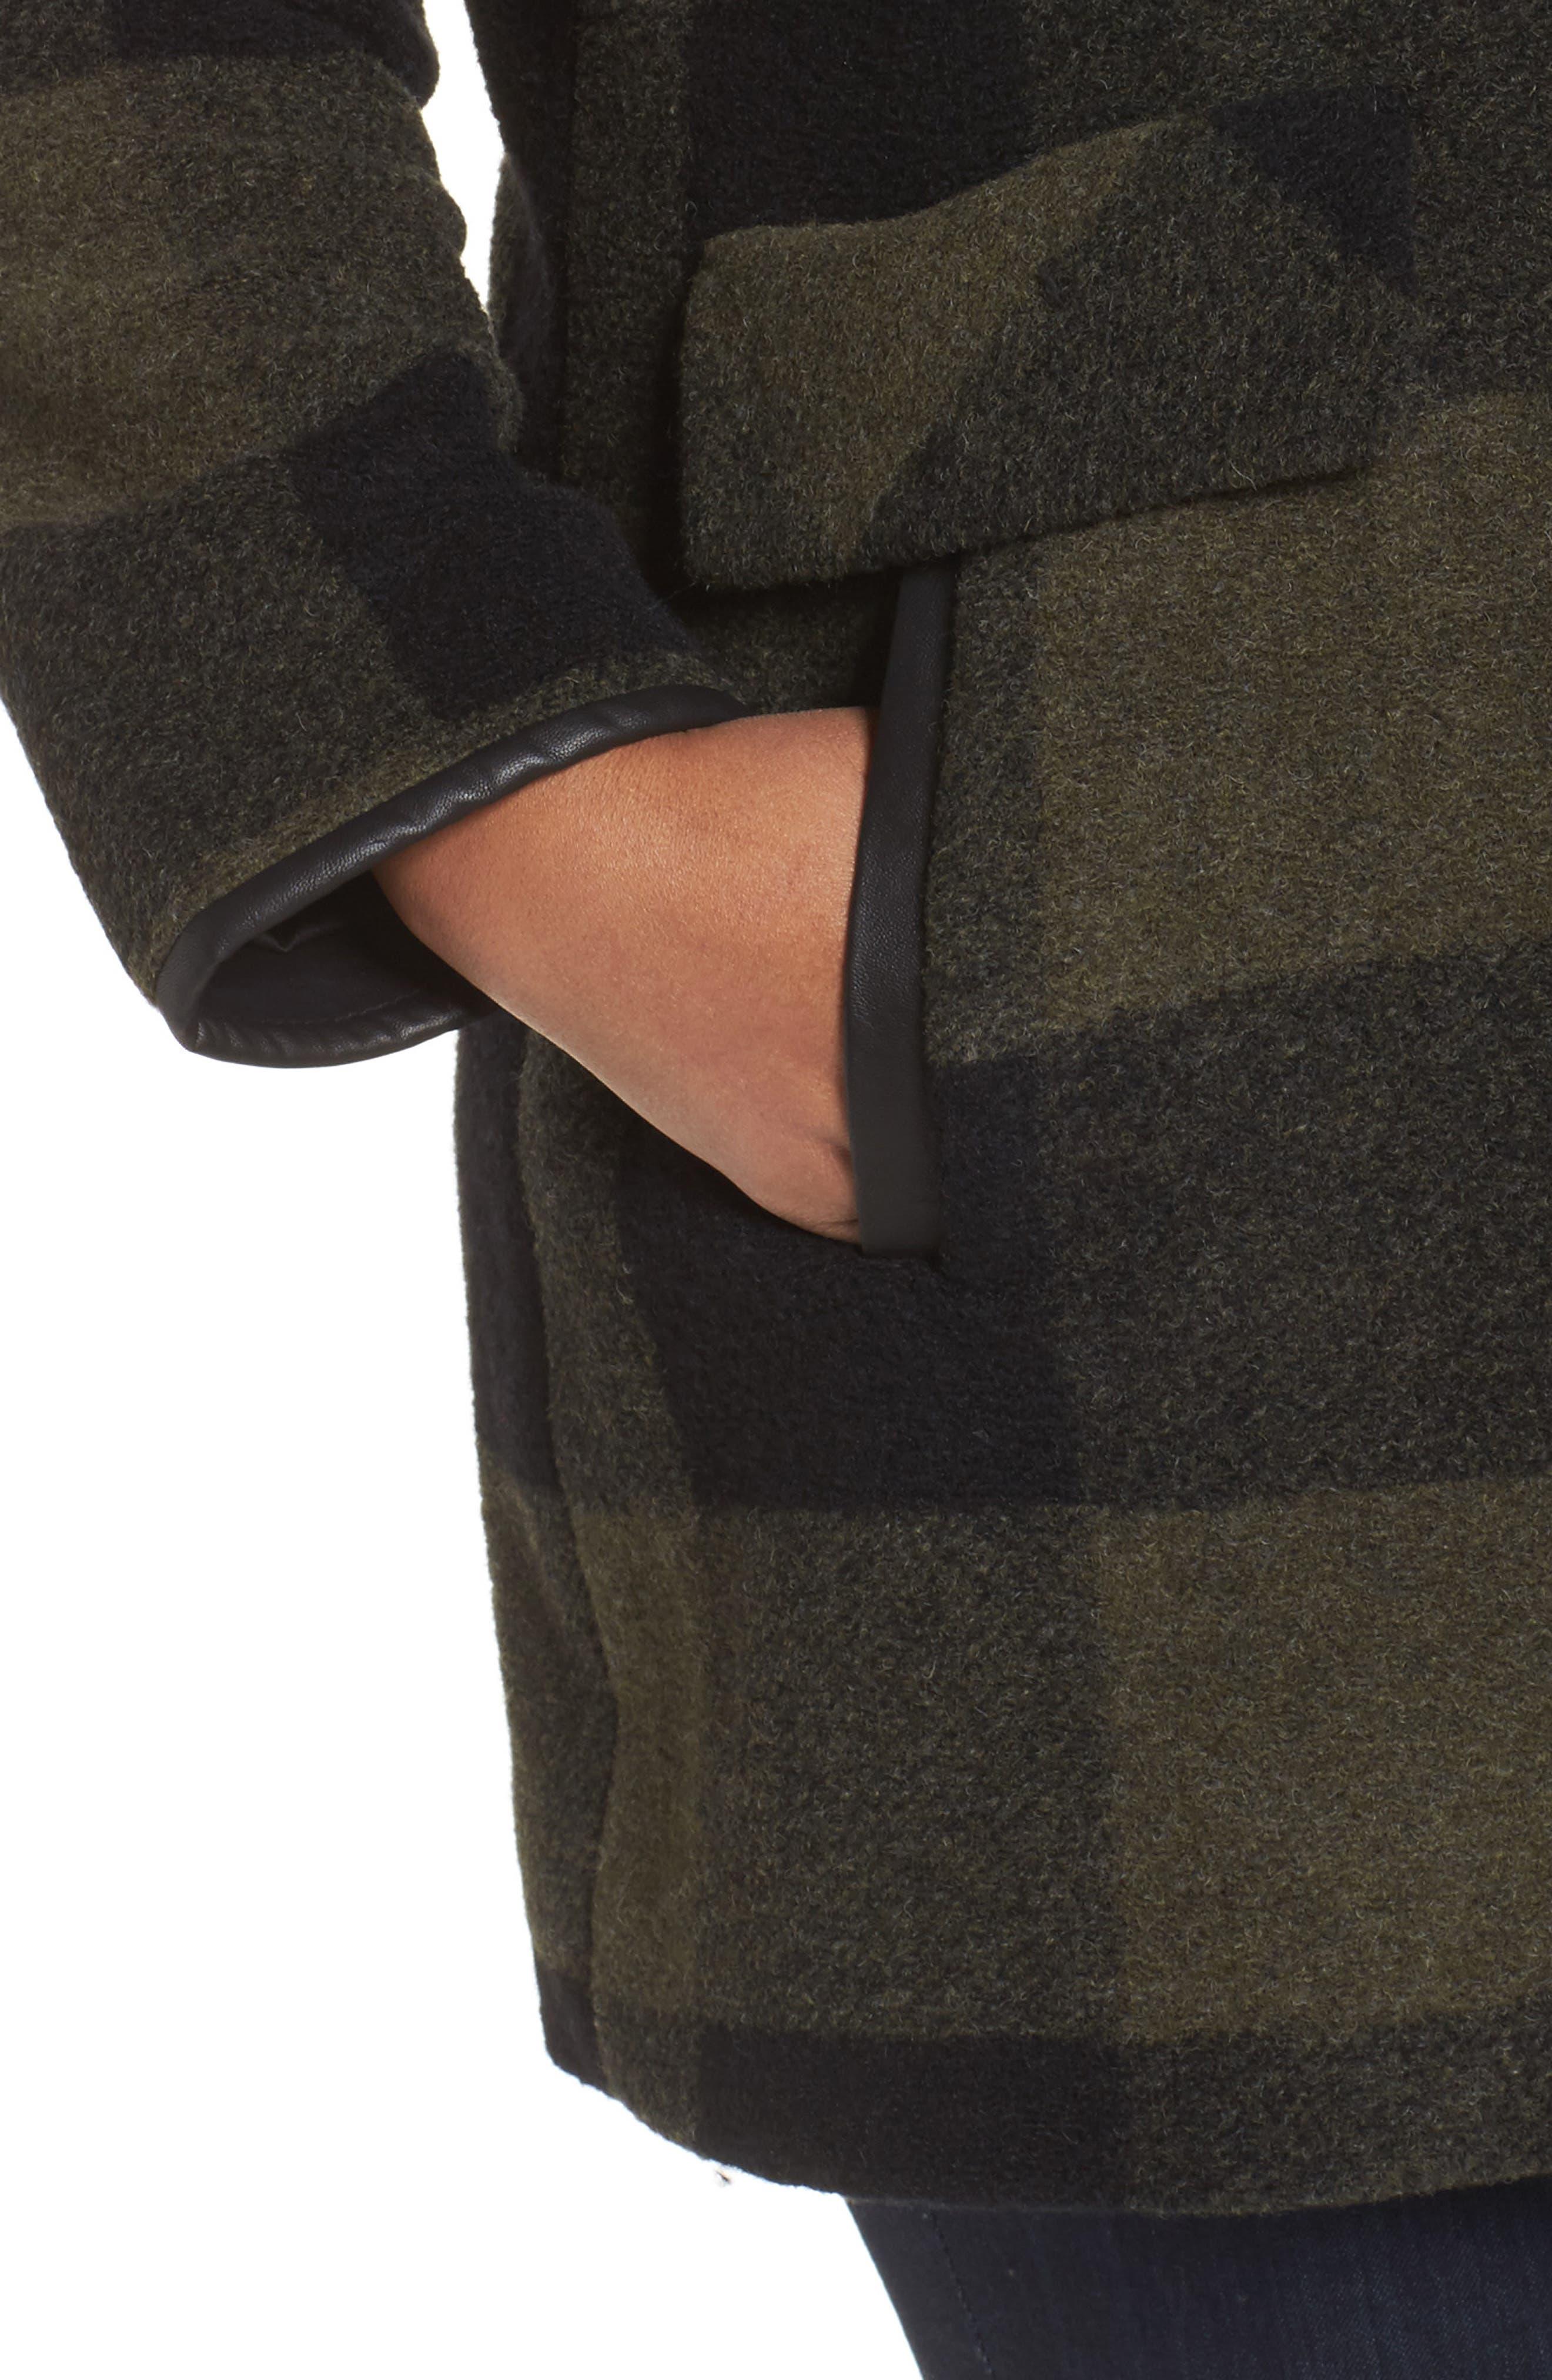 Paul Bunyan Plaid Wool Blend Barn Coat,                             Alternate thumbnail 4, color,                             Olive/ Buff